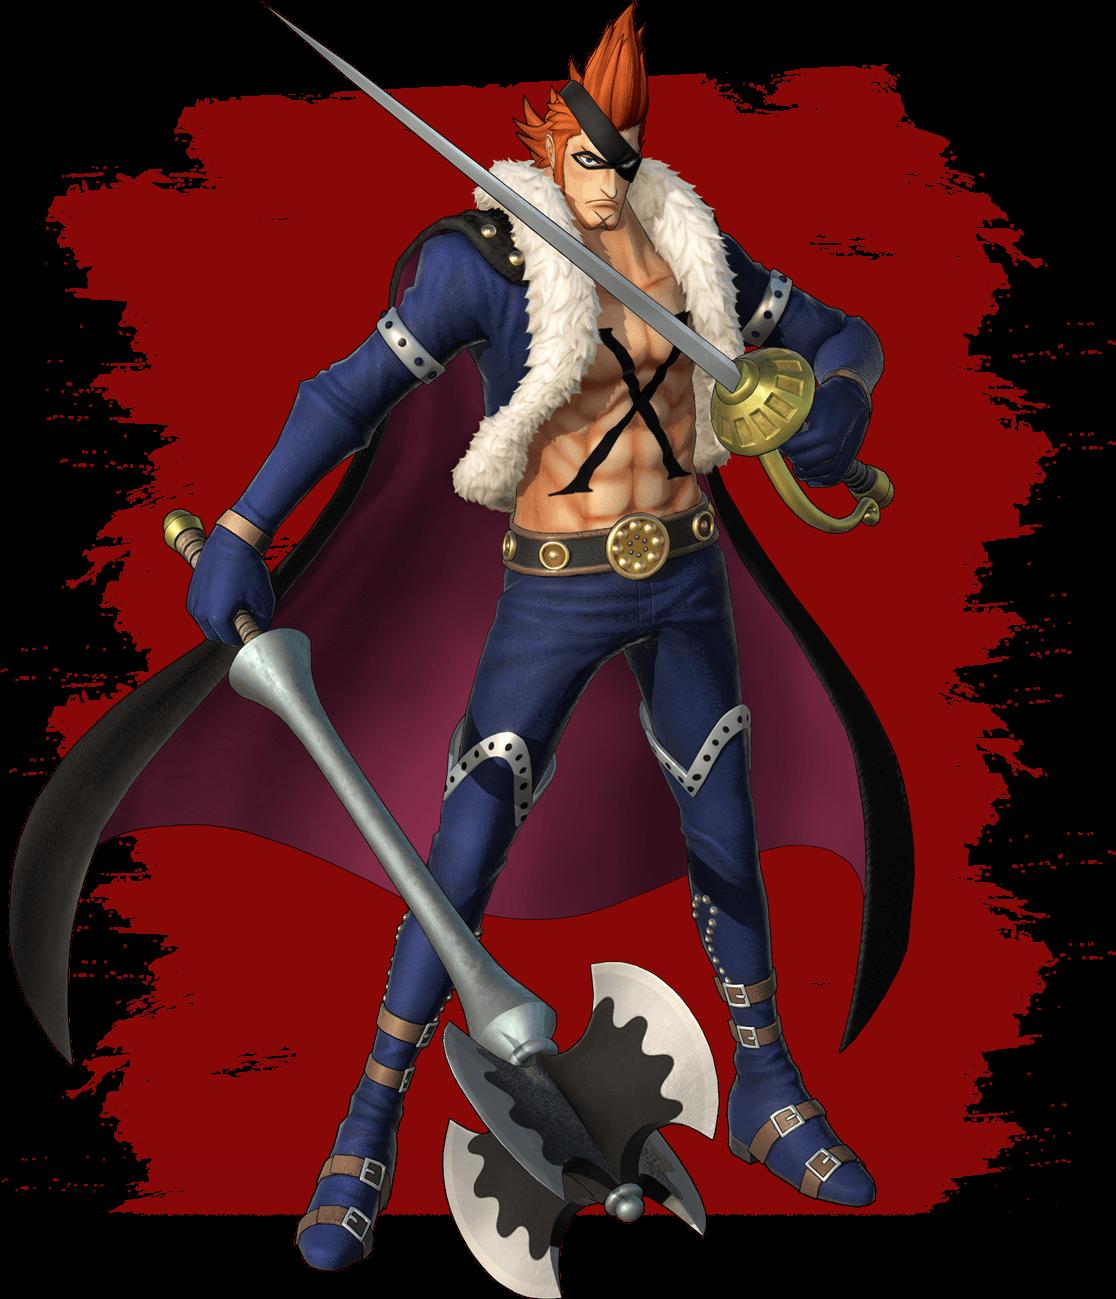 One-Piece-Pirate-Warriors-4_2020_07-19-20_001